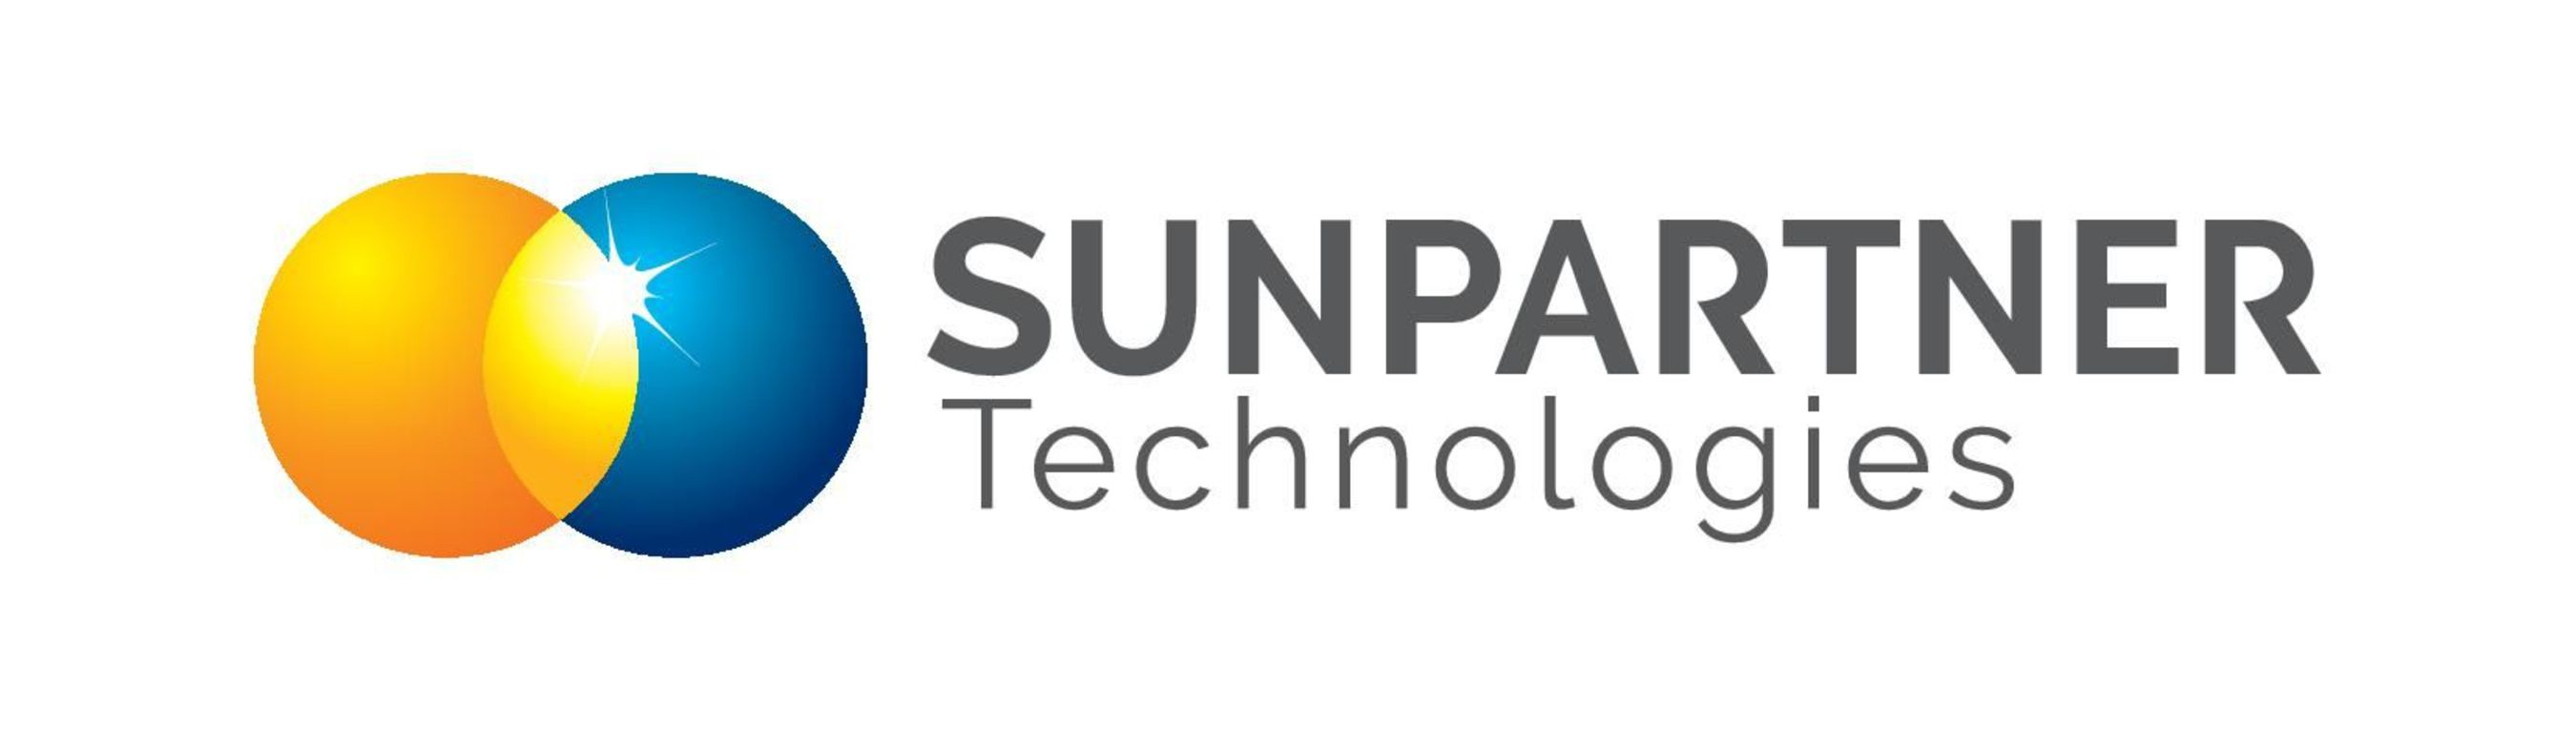 Sunpartner Technologies logo (PRNewsFoto/Sunpartner Technologies)